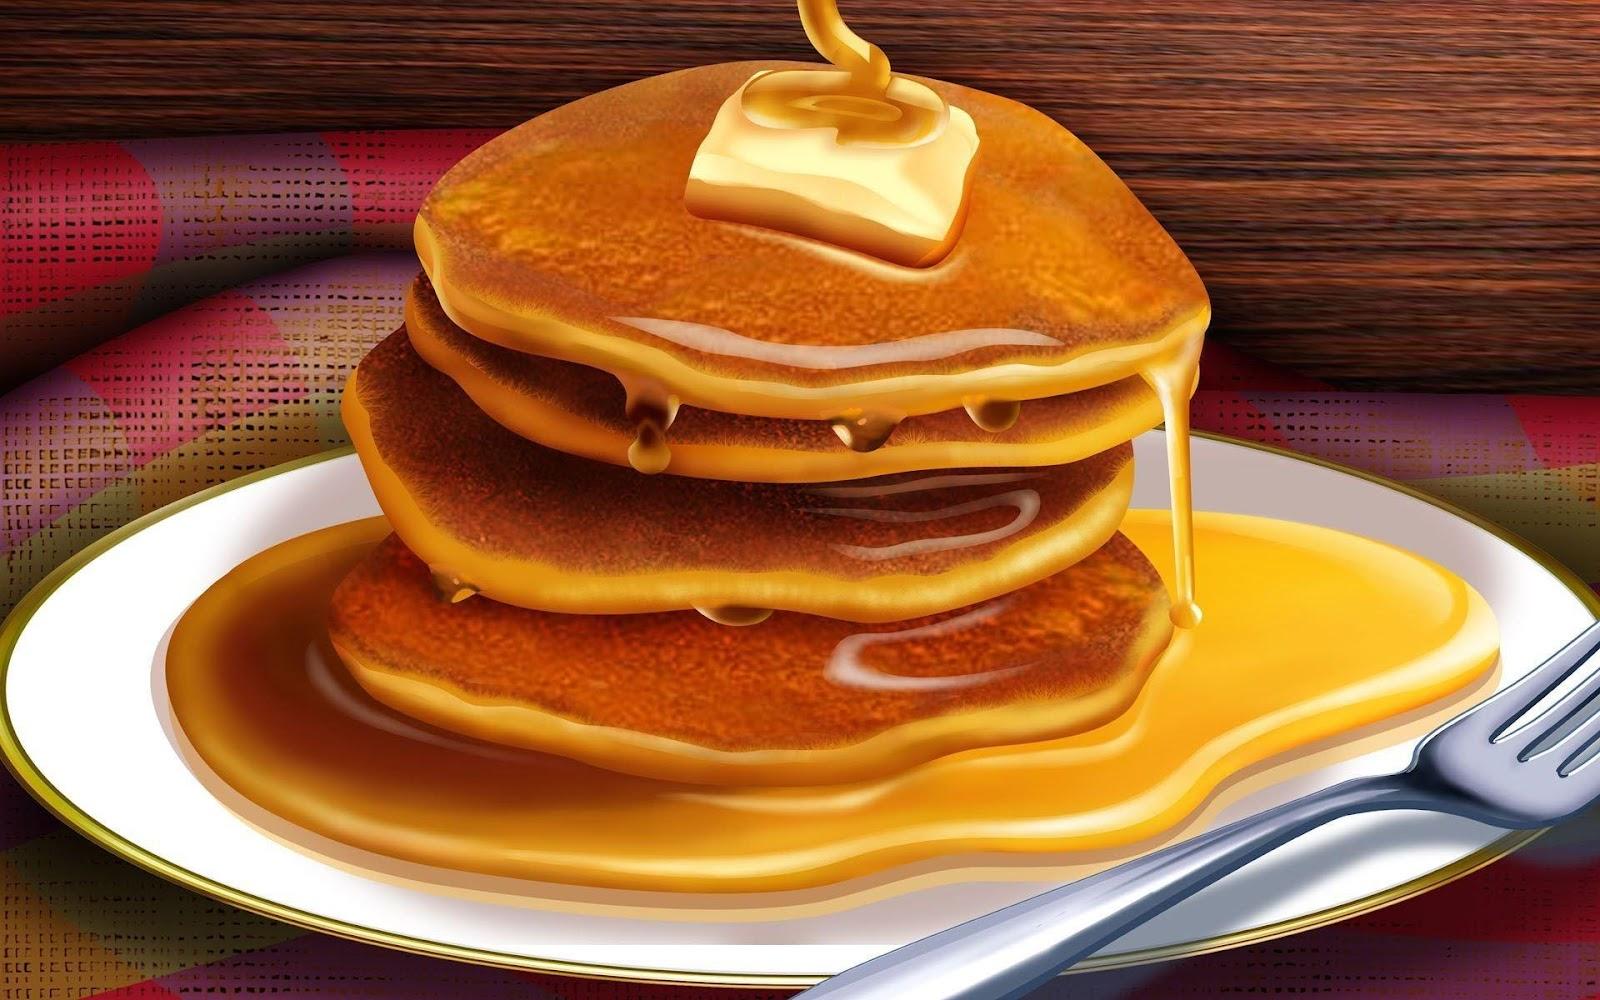 C:\Users\rwil313\Desktop\Pancakes and maple syrup (updated).jpg